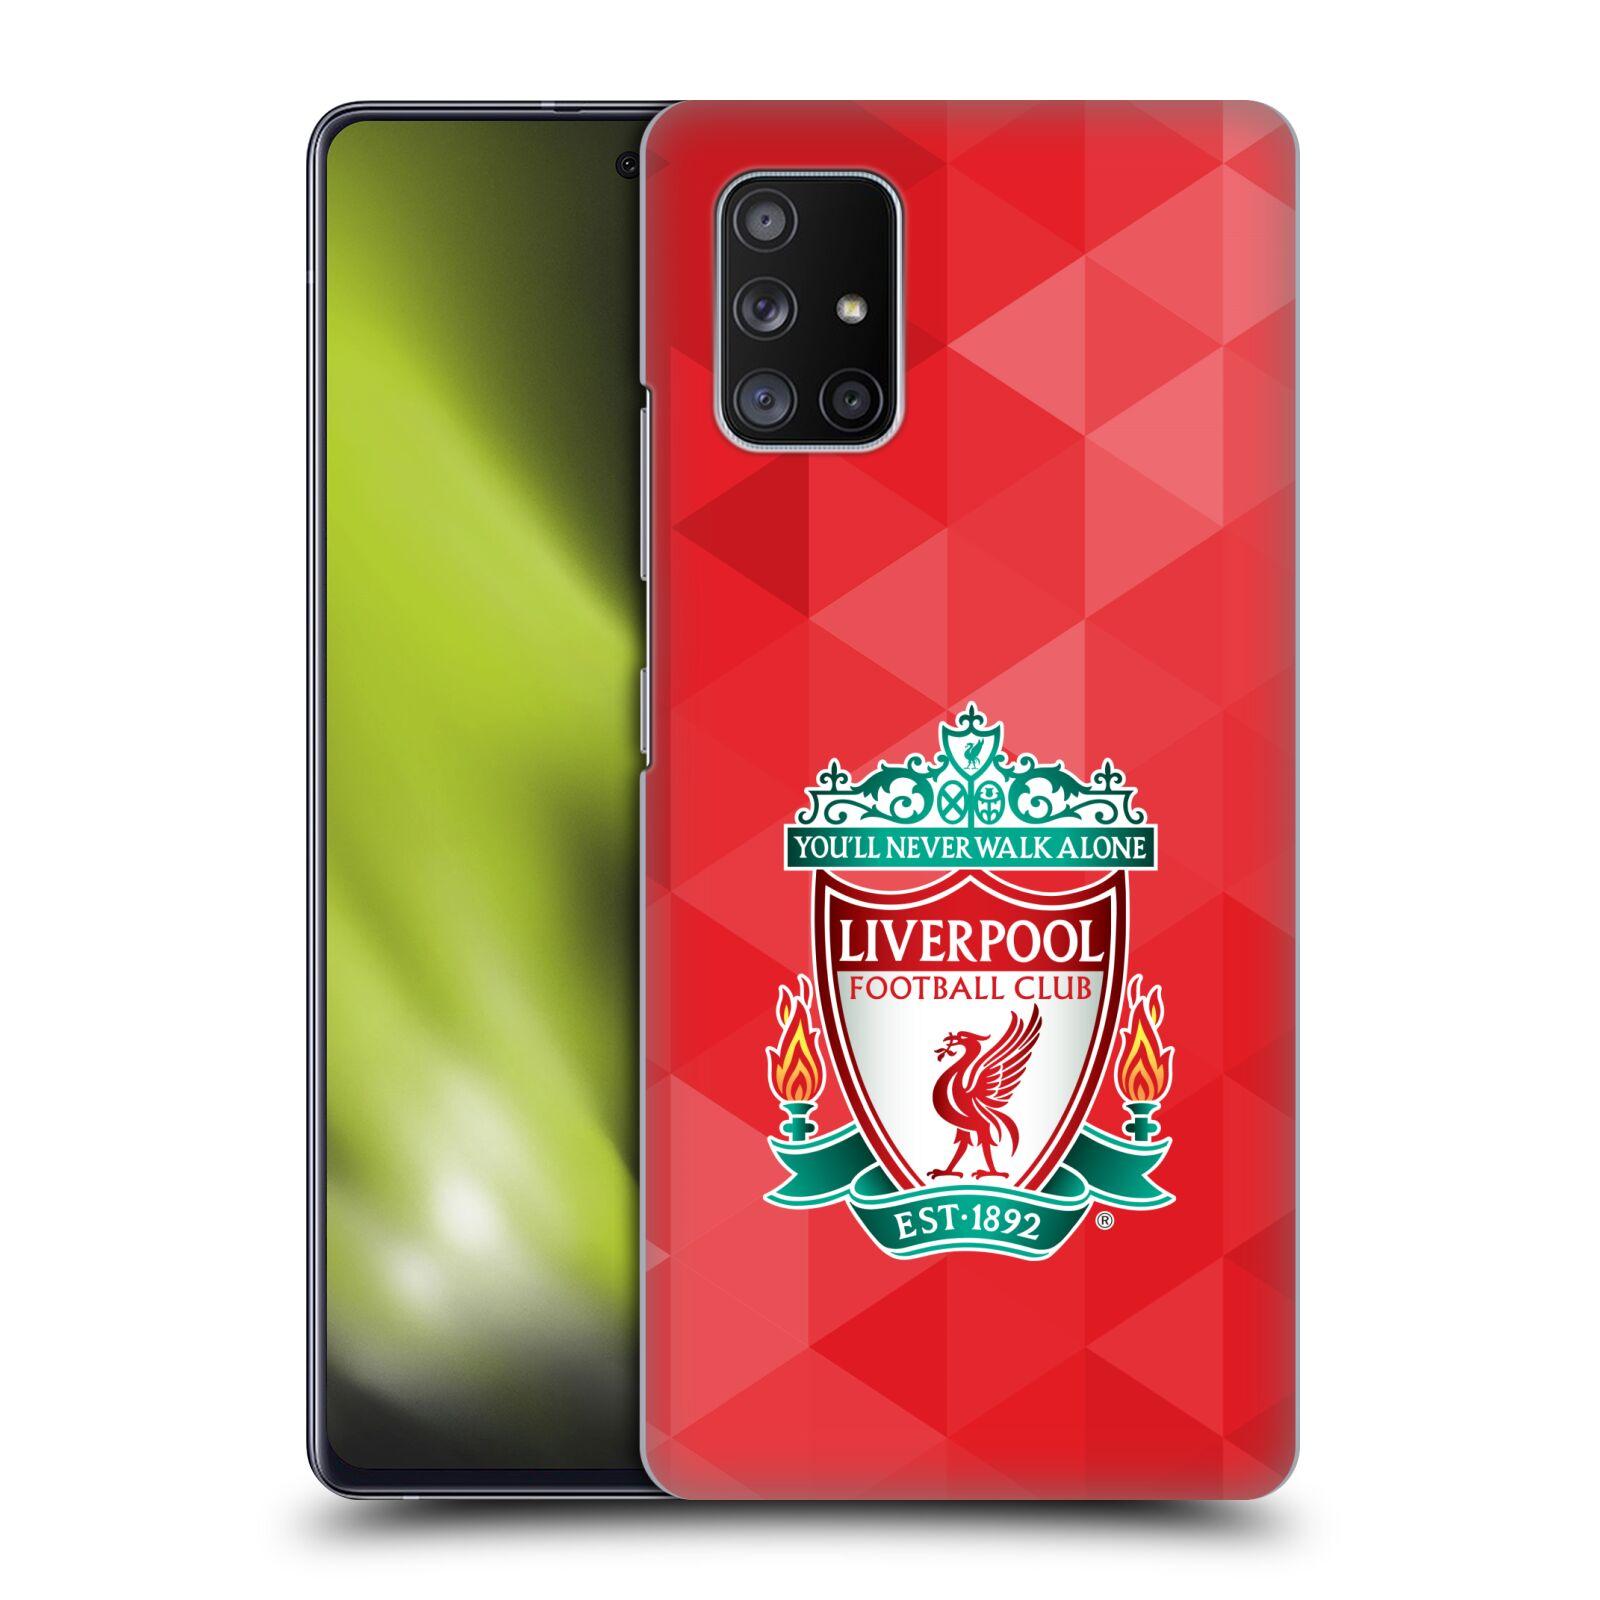 Plastové pouzdro na mobil Samsung Galaxy A51 5G - Head Case - ZNAK LIVERPOOL FC OFFICIAL GEOMETRIC RED